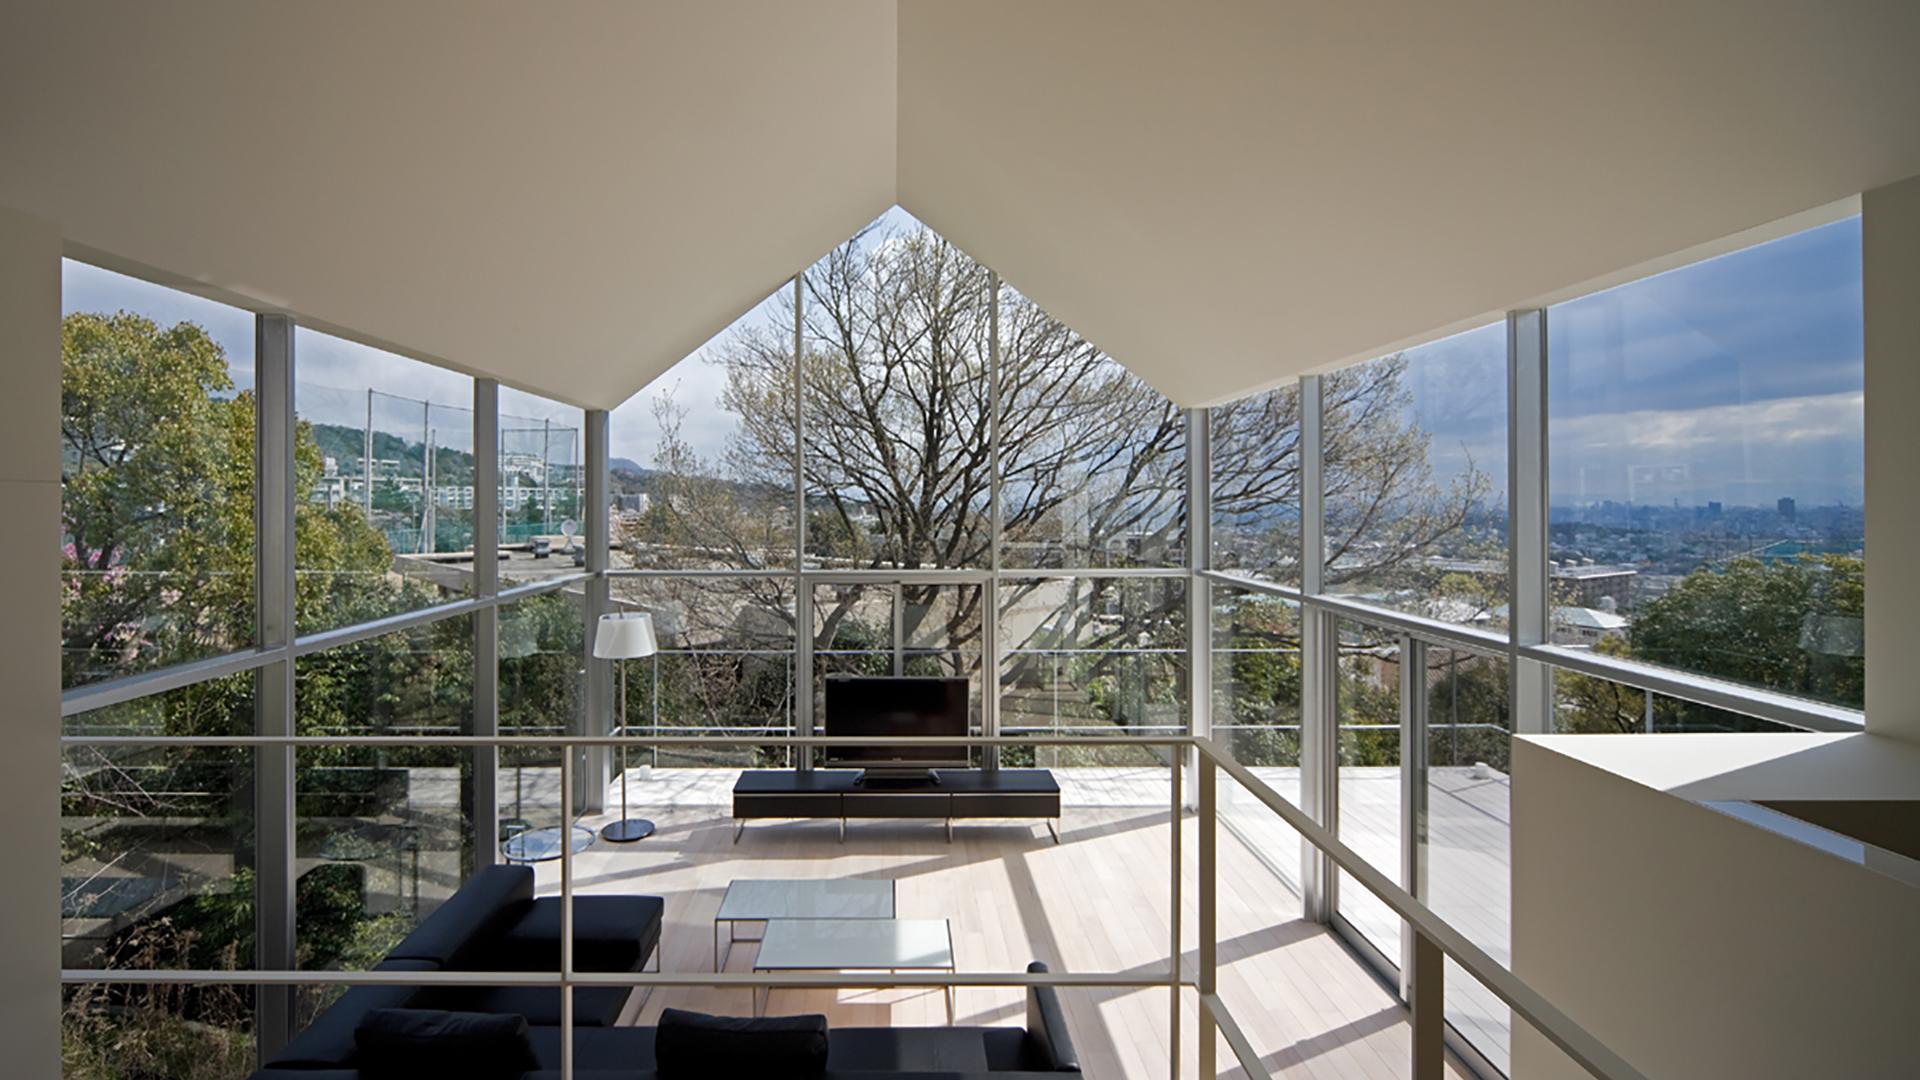 HOUSE WITH OAK TREE